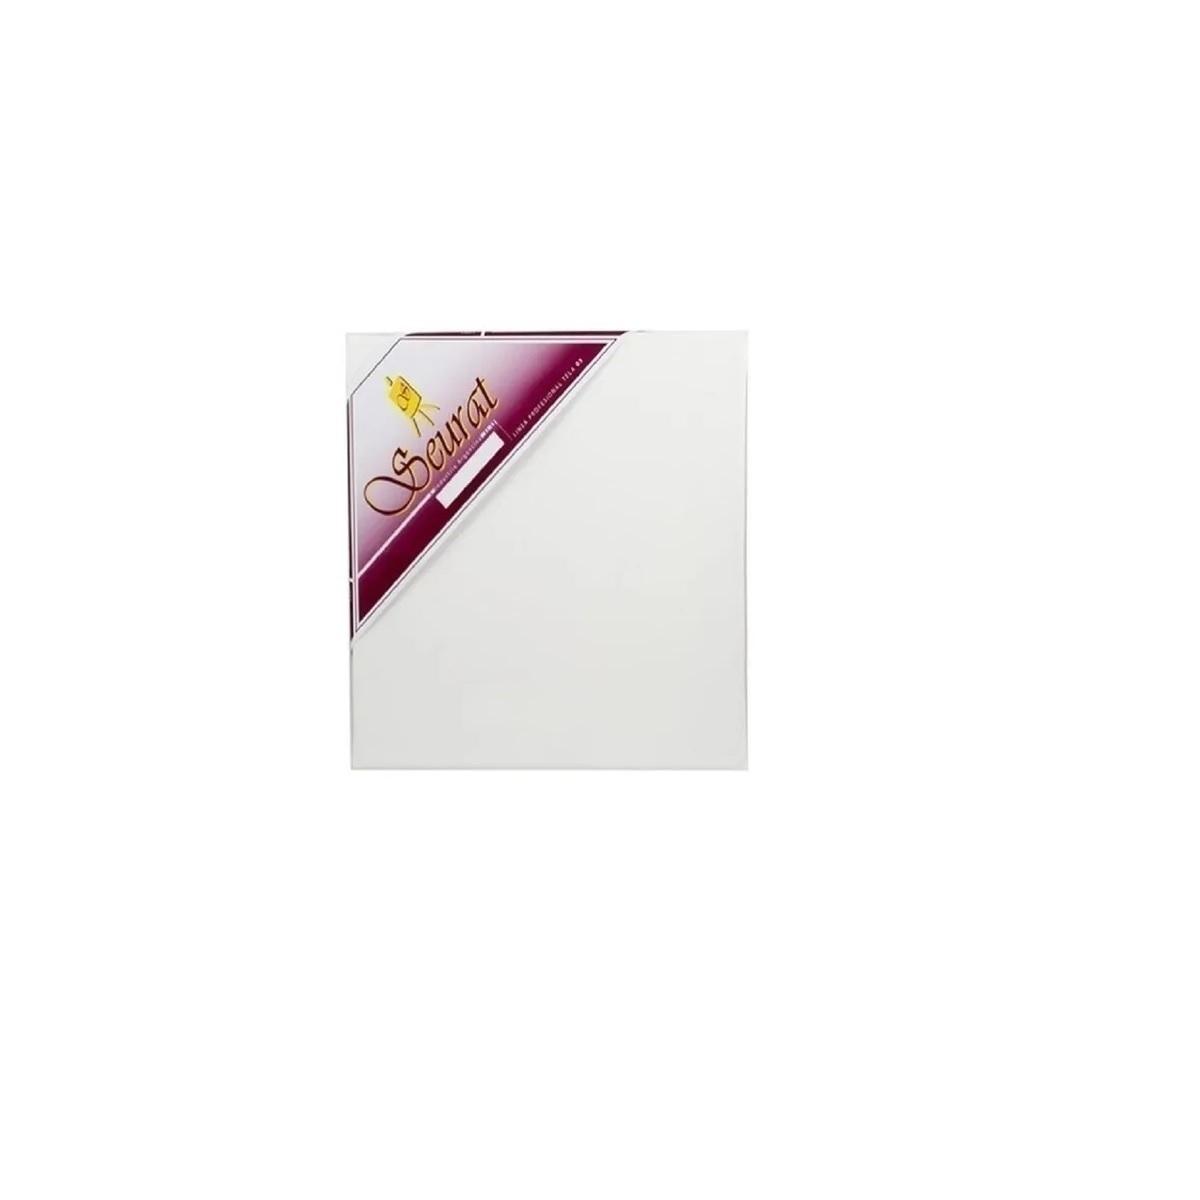 325070 SEURAT                                                       | BASTIDOR 50 X 70 CM TELA ESTUDIO GRANO FINO M-2 (2,5X3,5 CM)